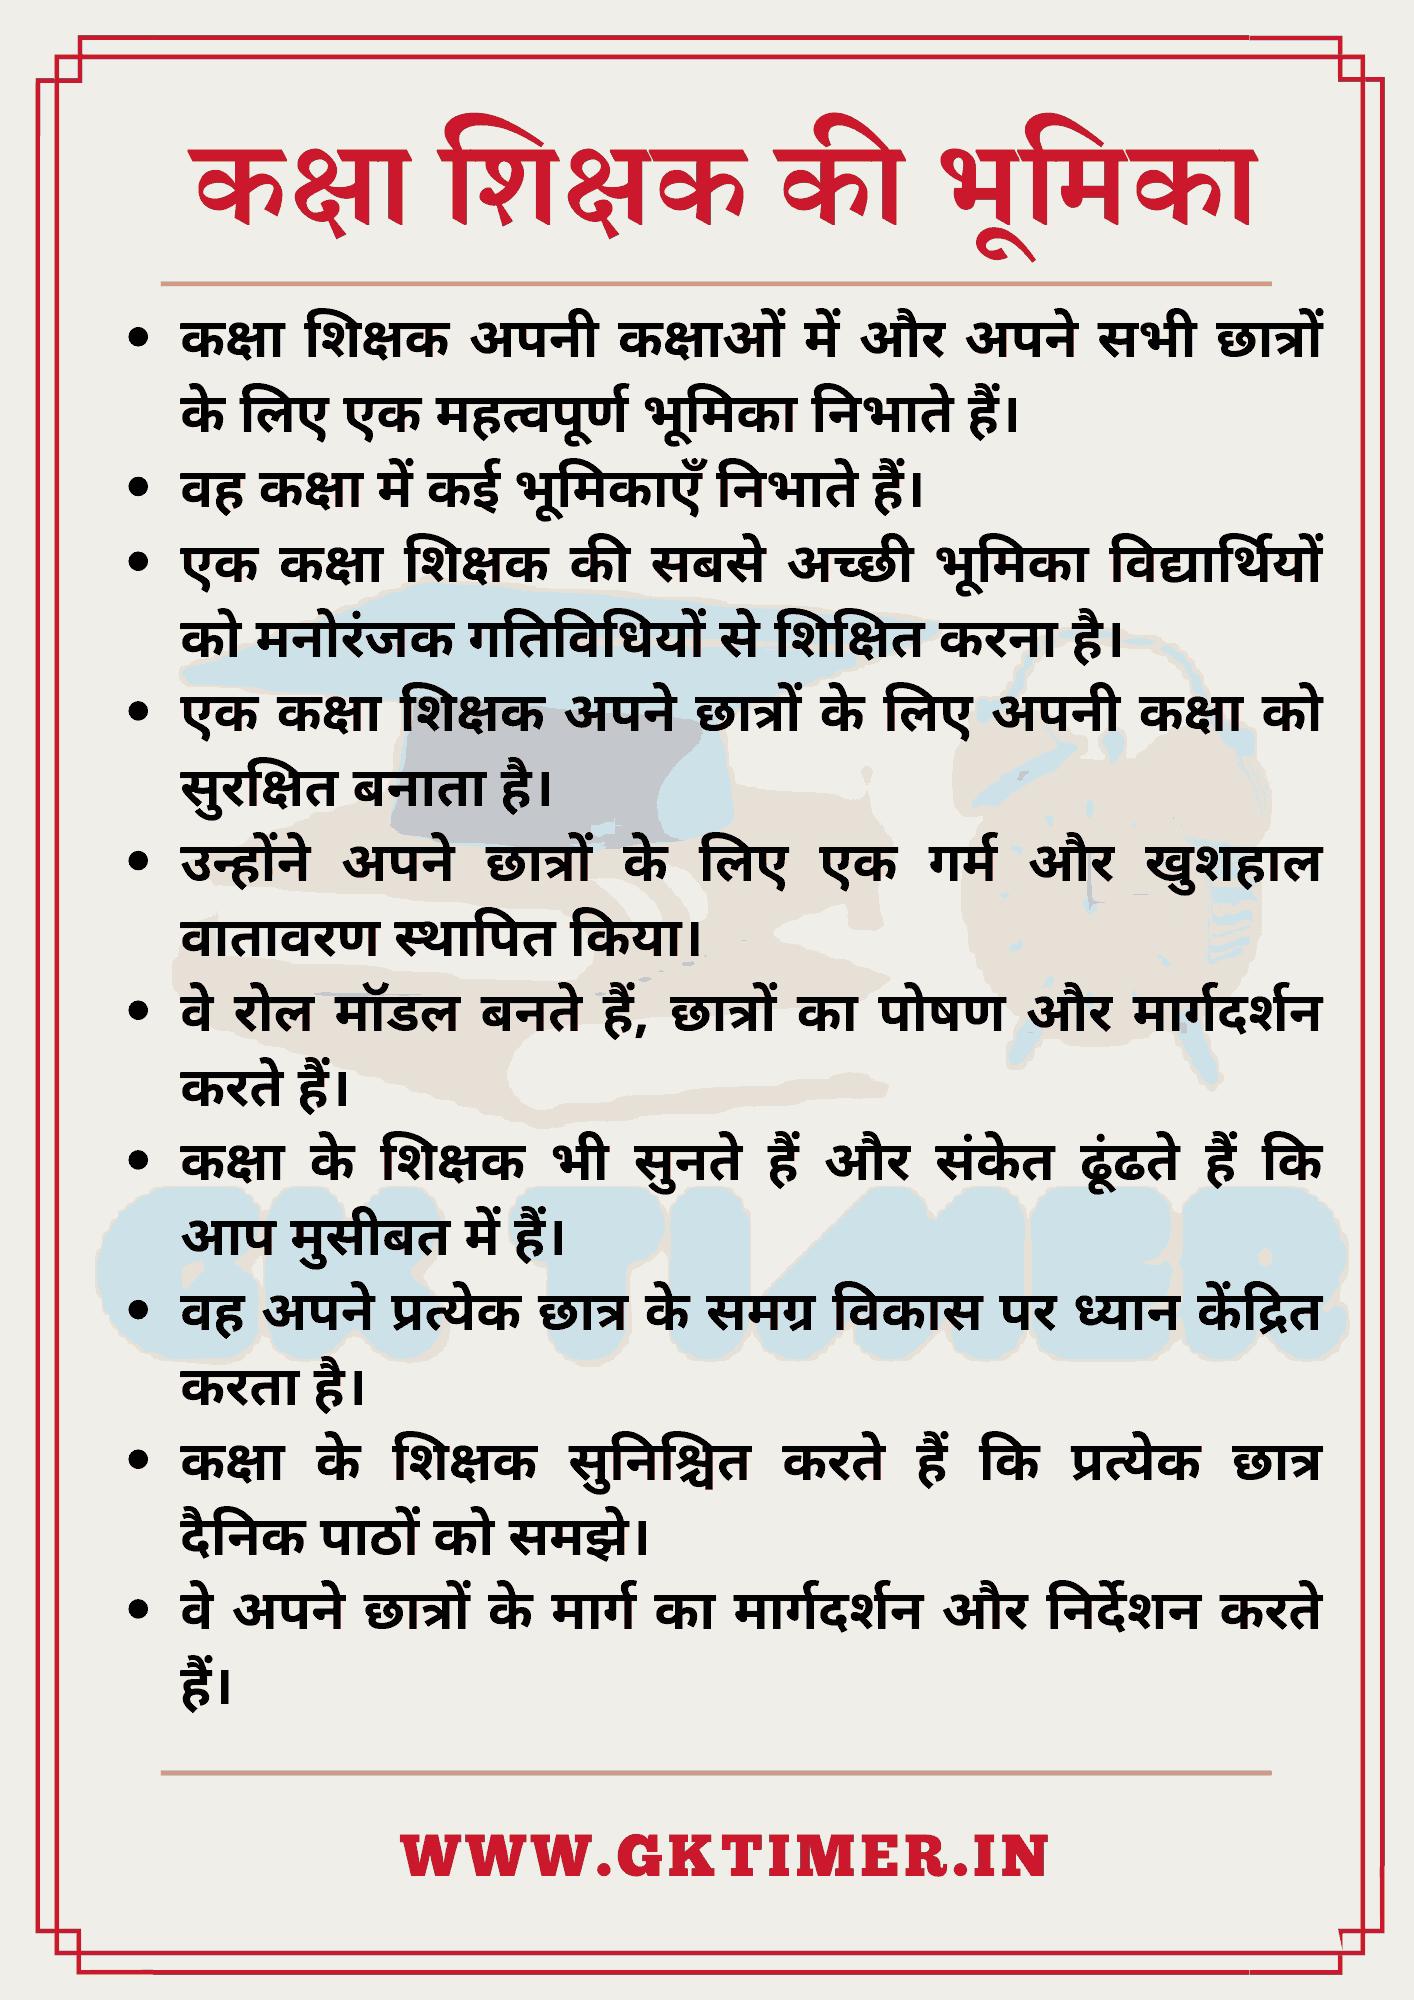 कक्षा शिक्षक की भूमिका पर निबंध | Role of Class Teacher Essay in Hindi | 10 Lines on Role of Class Teacher in Hindi